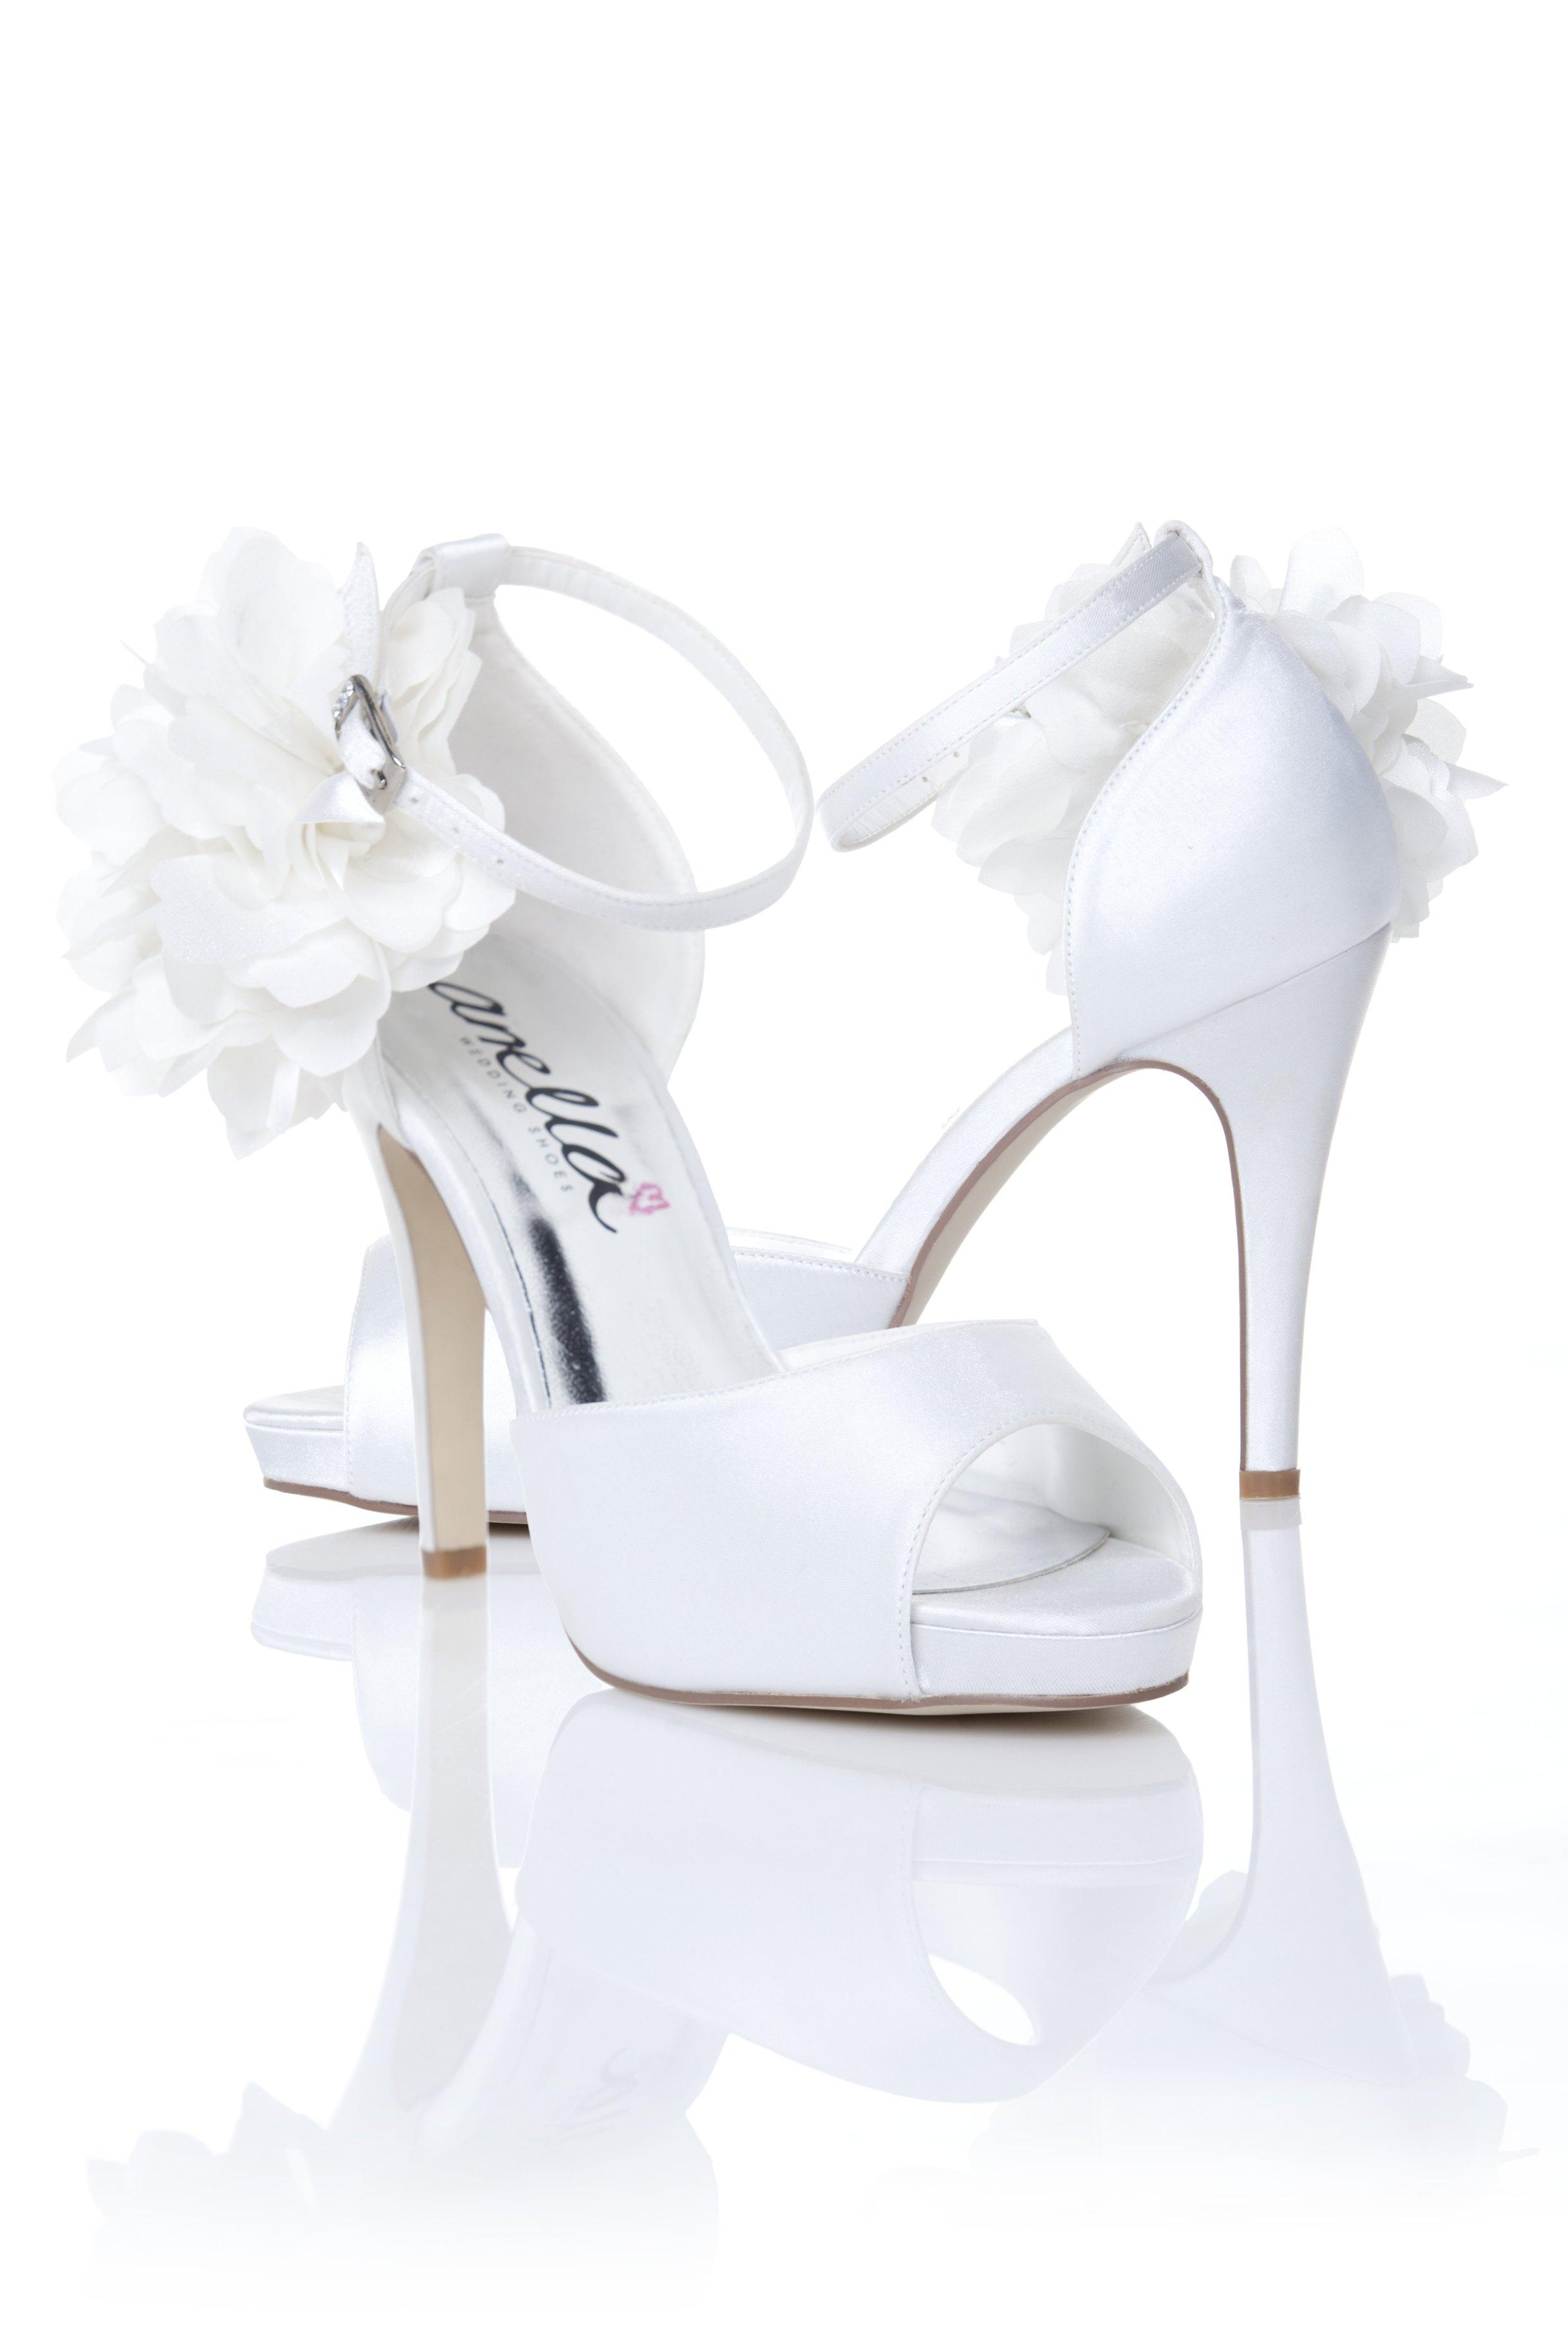 wedding shoes comfortable photo - 1